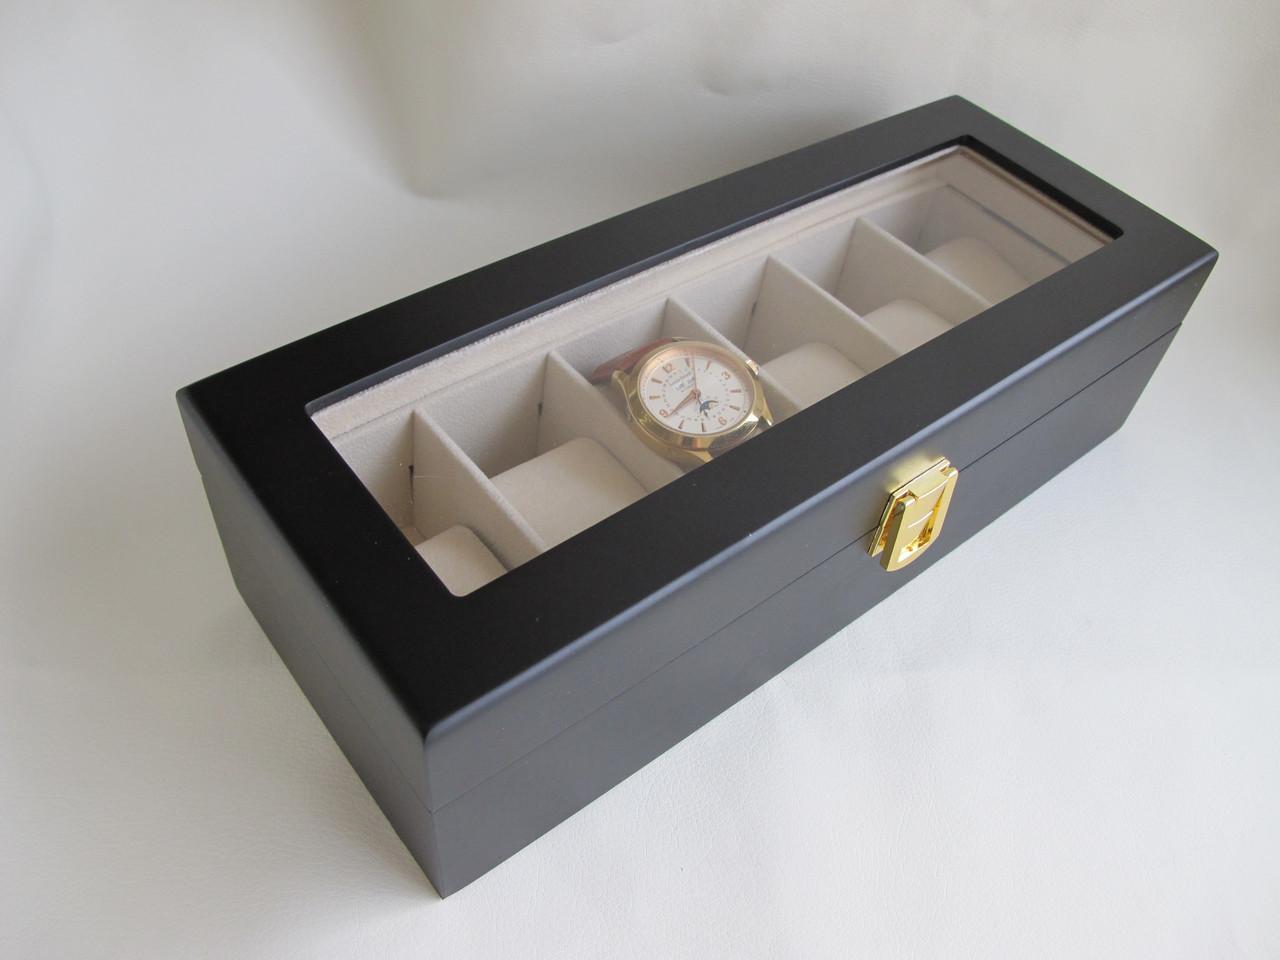 Шкатулка для хранения часов Craft 6WB.LID.MAT.BL